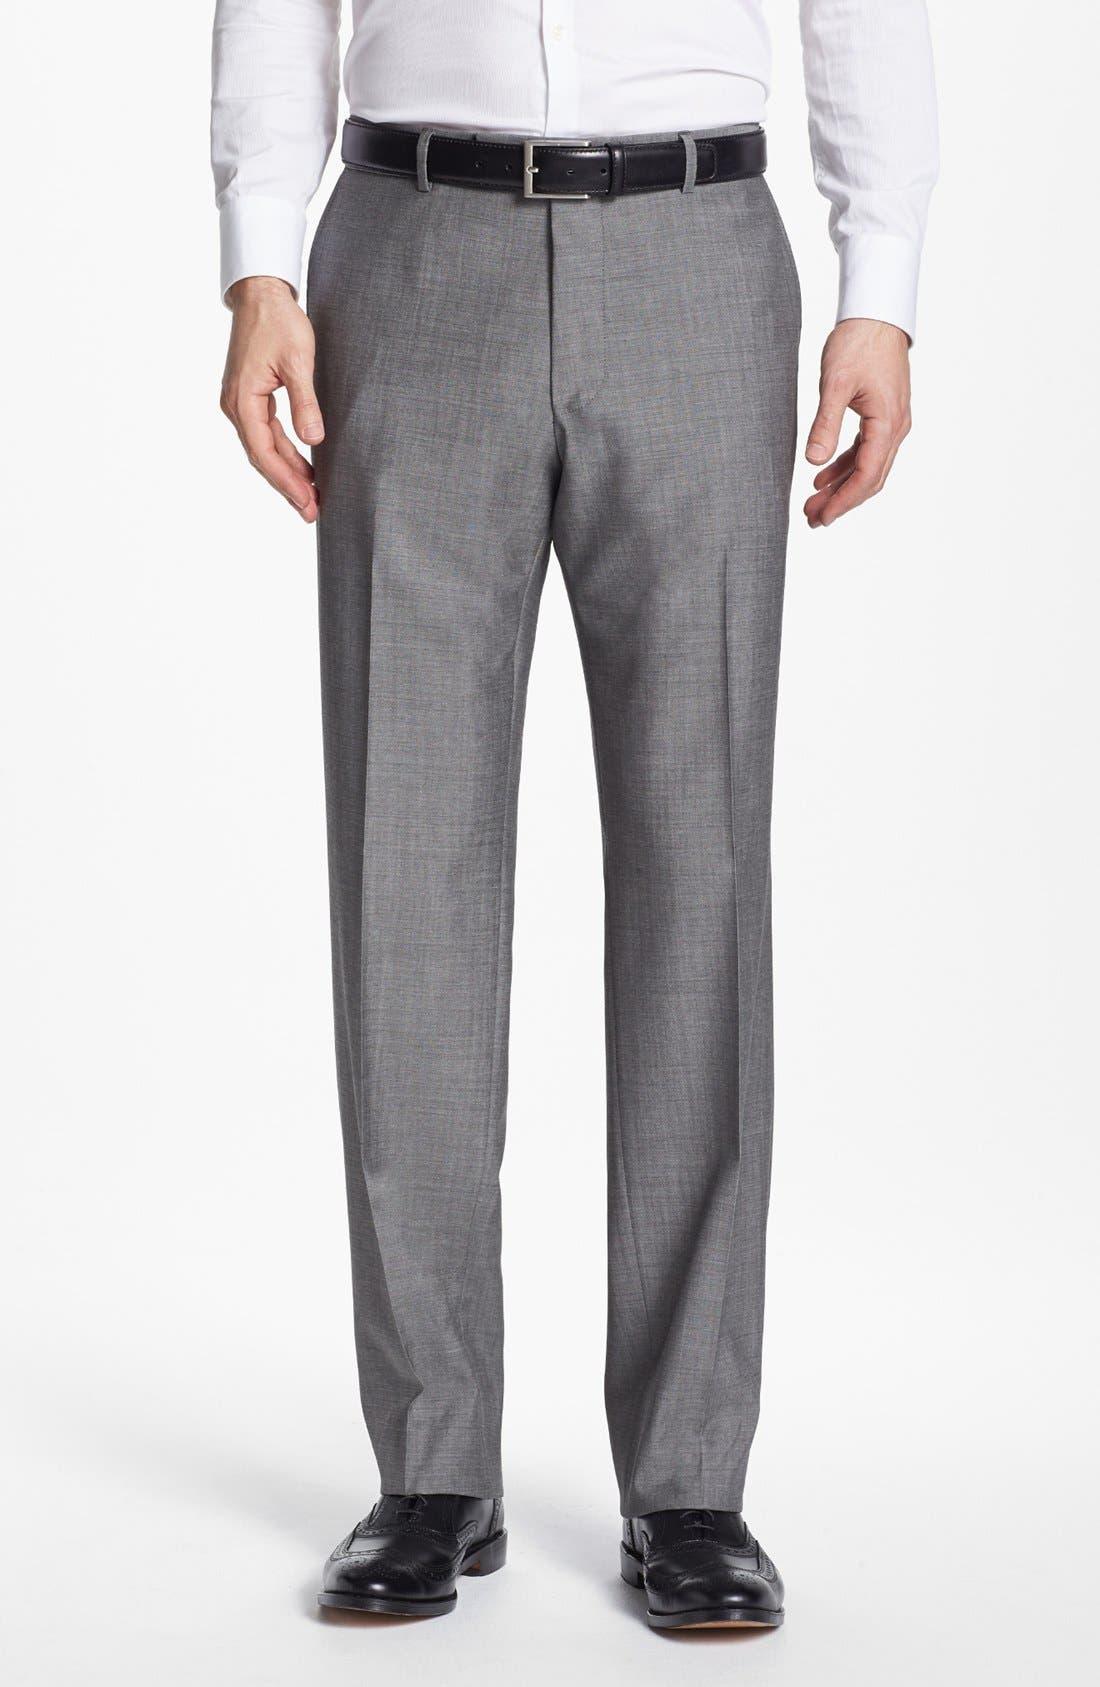 BOSS HUGO BOSS 'Jeffrey US' Flat Front Pinpoint Wool Trousers,                             Main thumbnail 1, color,                             022